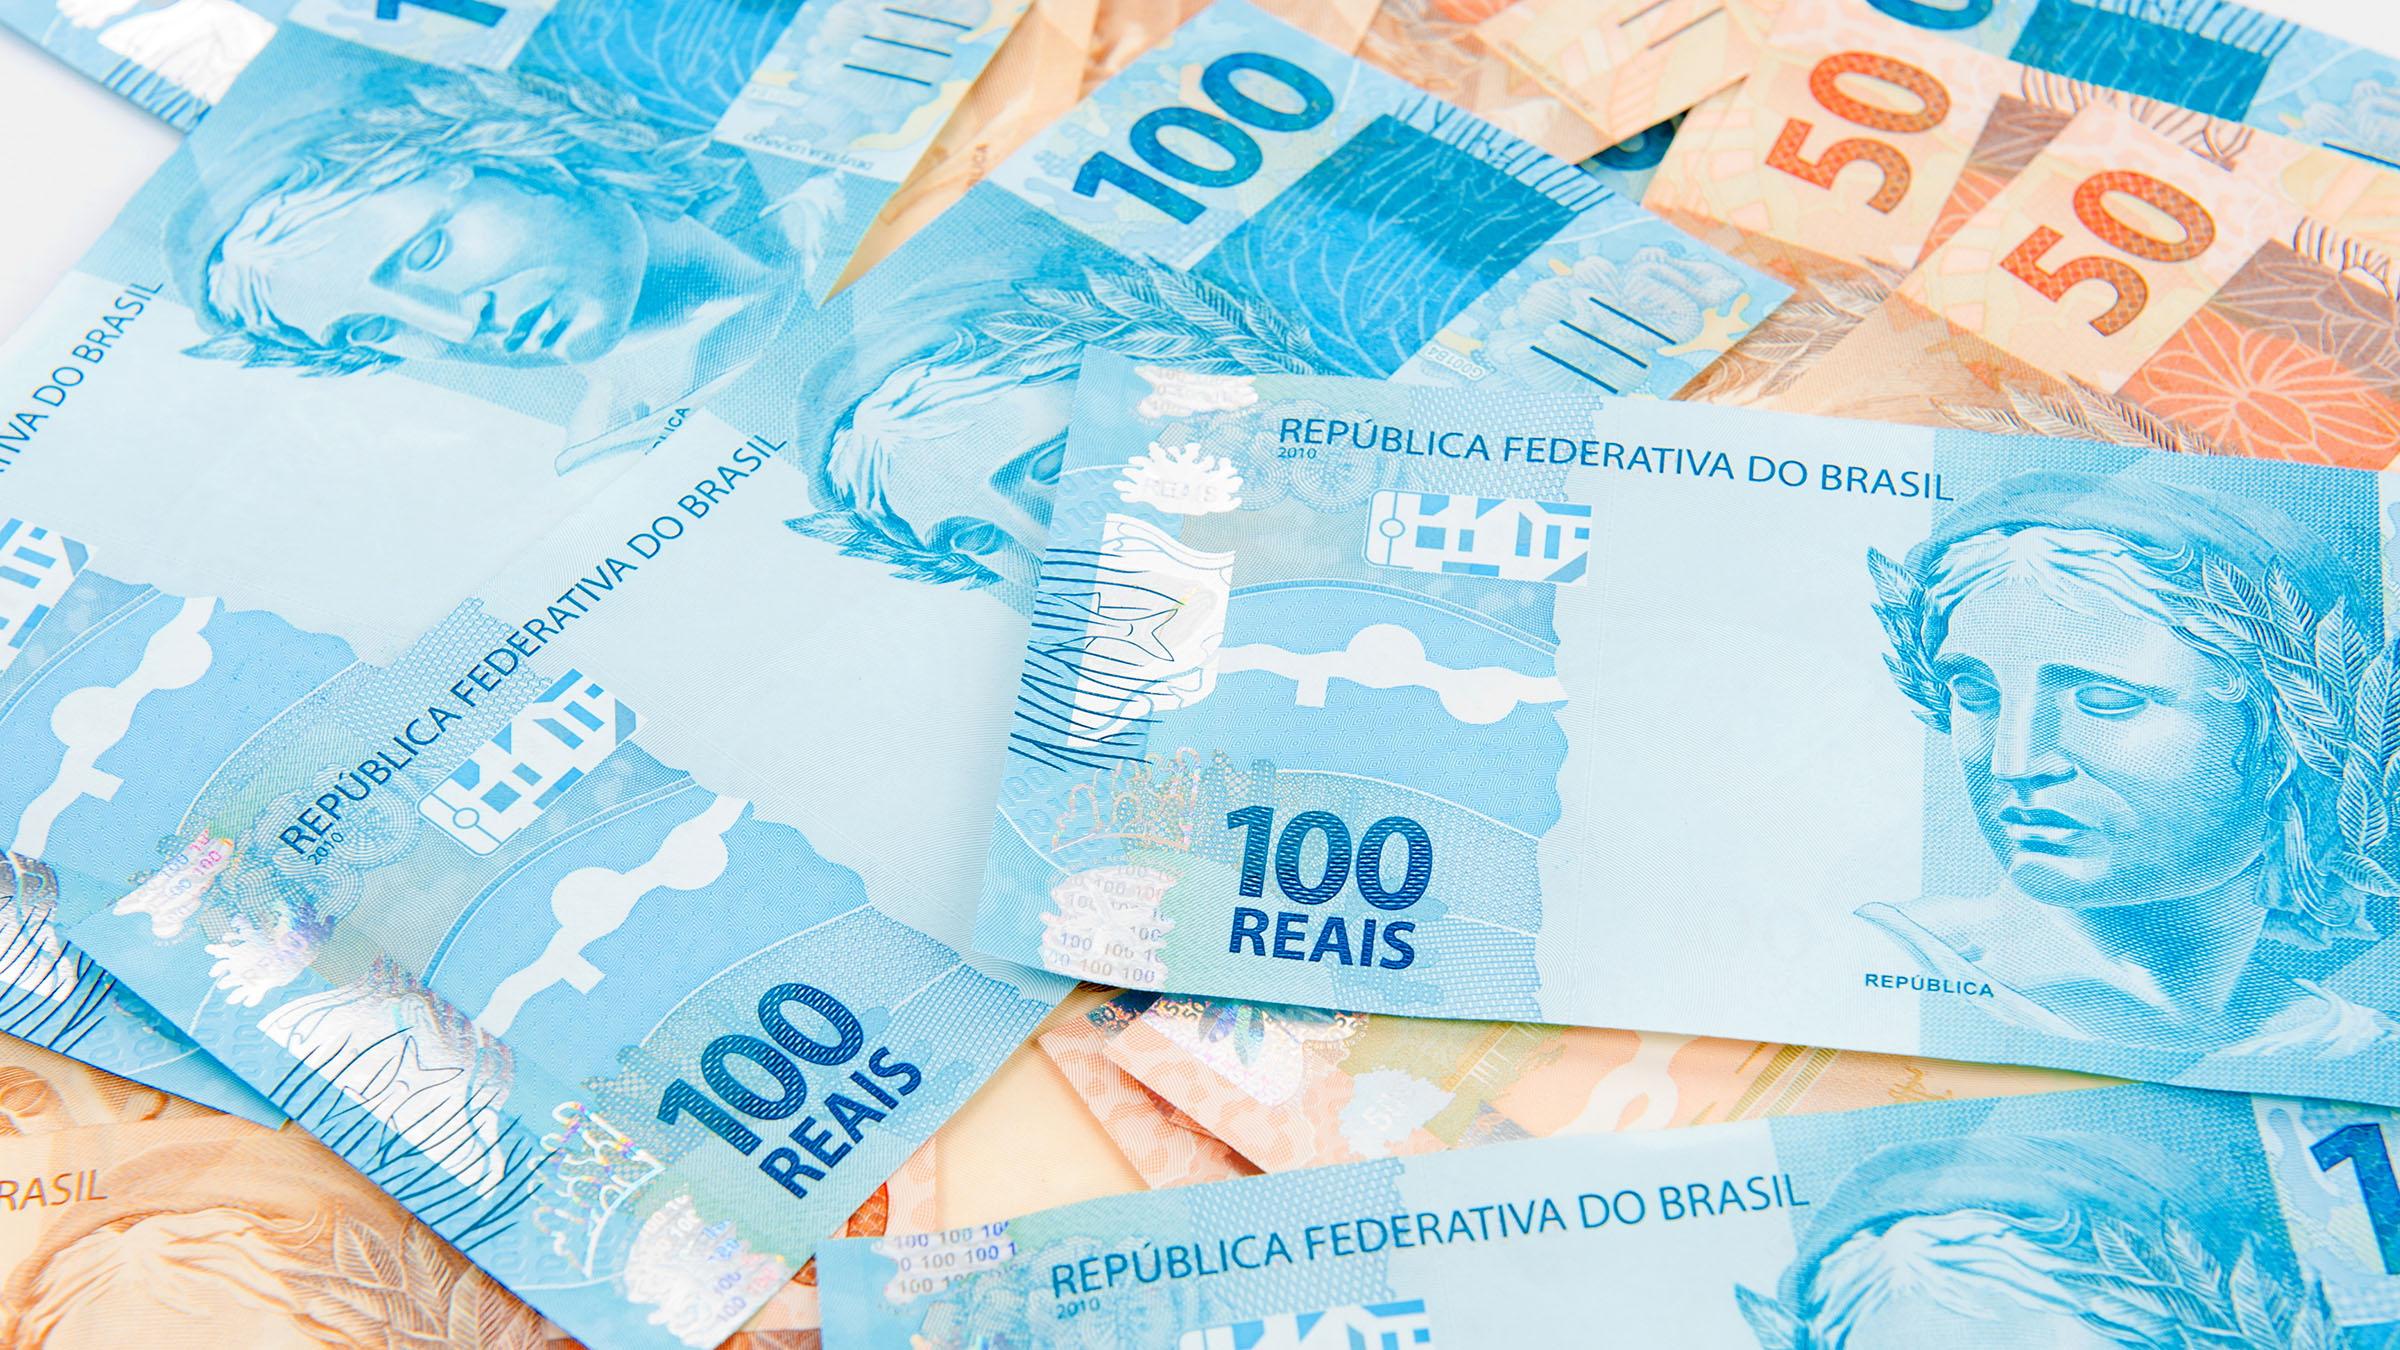 Reales moneda de brasil